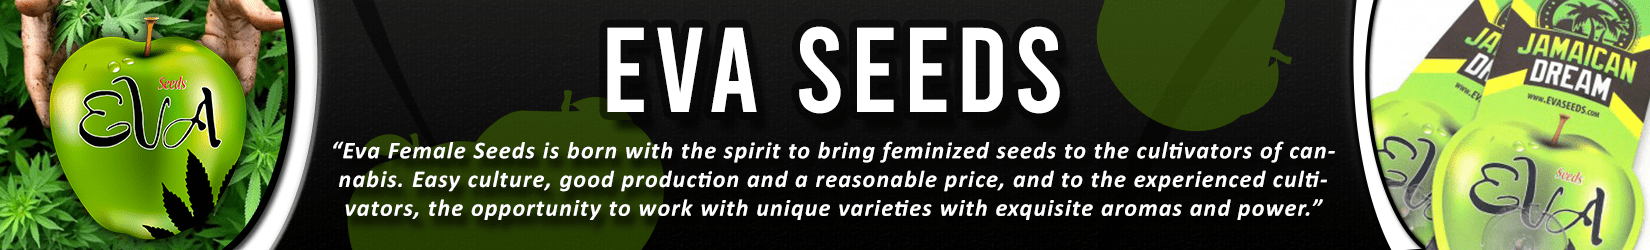 Cannabis Seeds Breeder - Eva Seeds